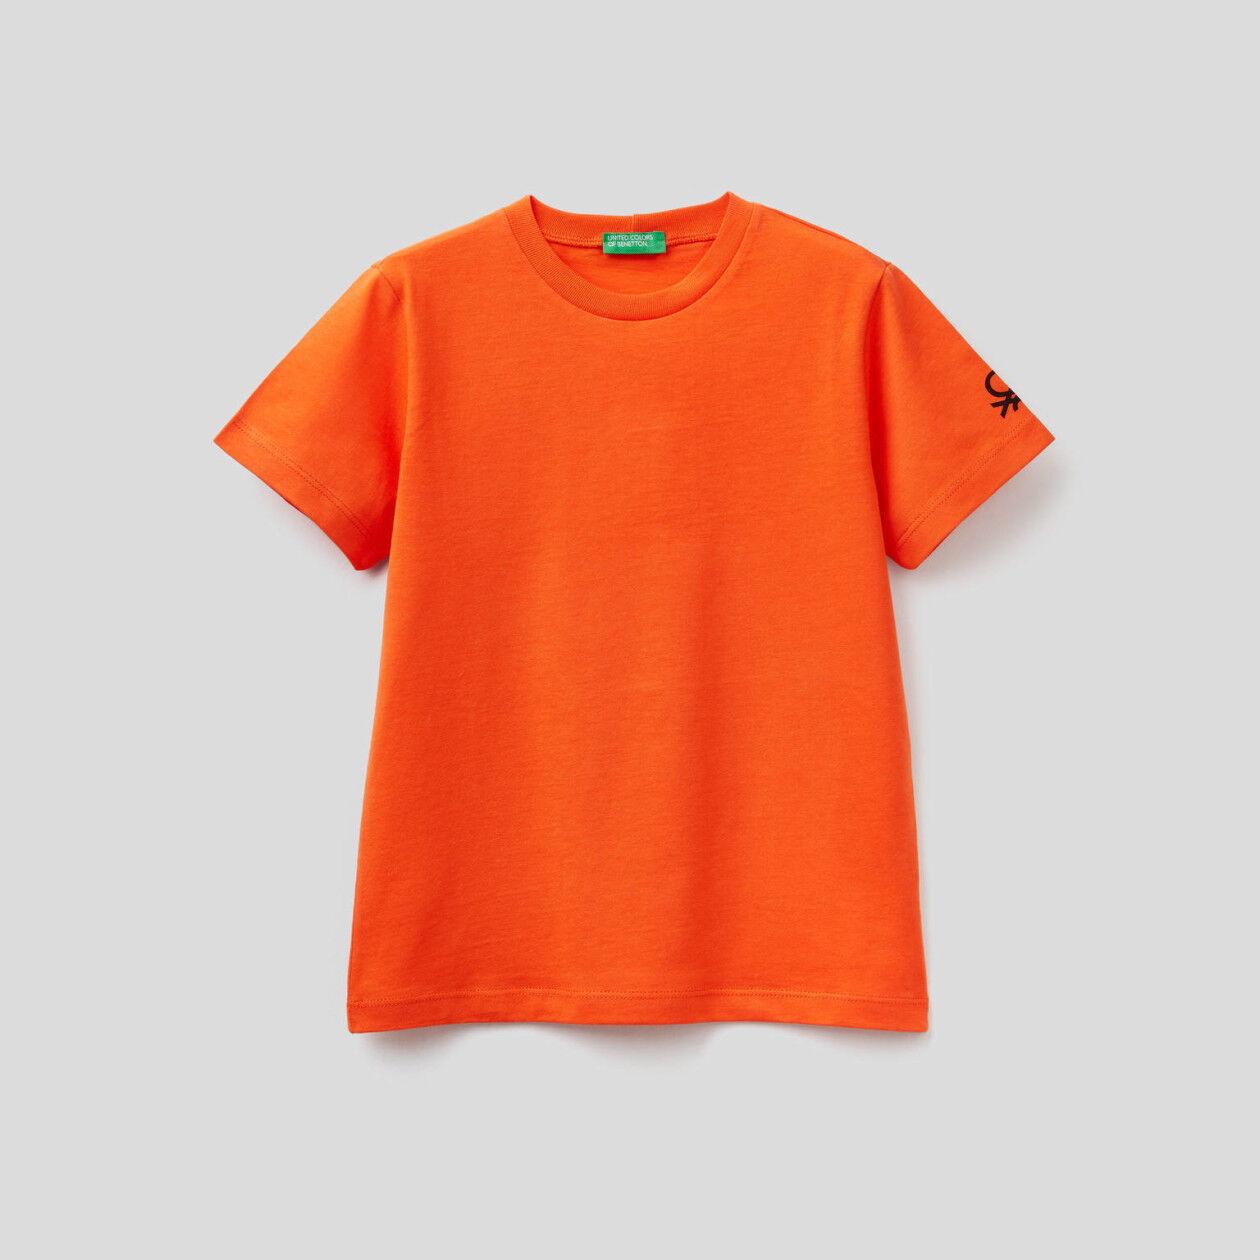 Pantal/ón para Ni/ñas Z6ERJ United Colors of Benetton